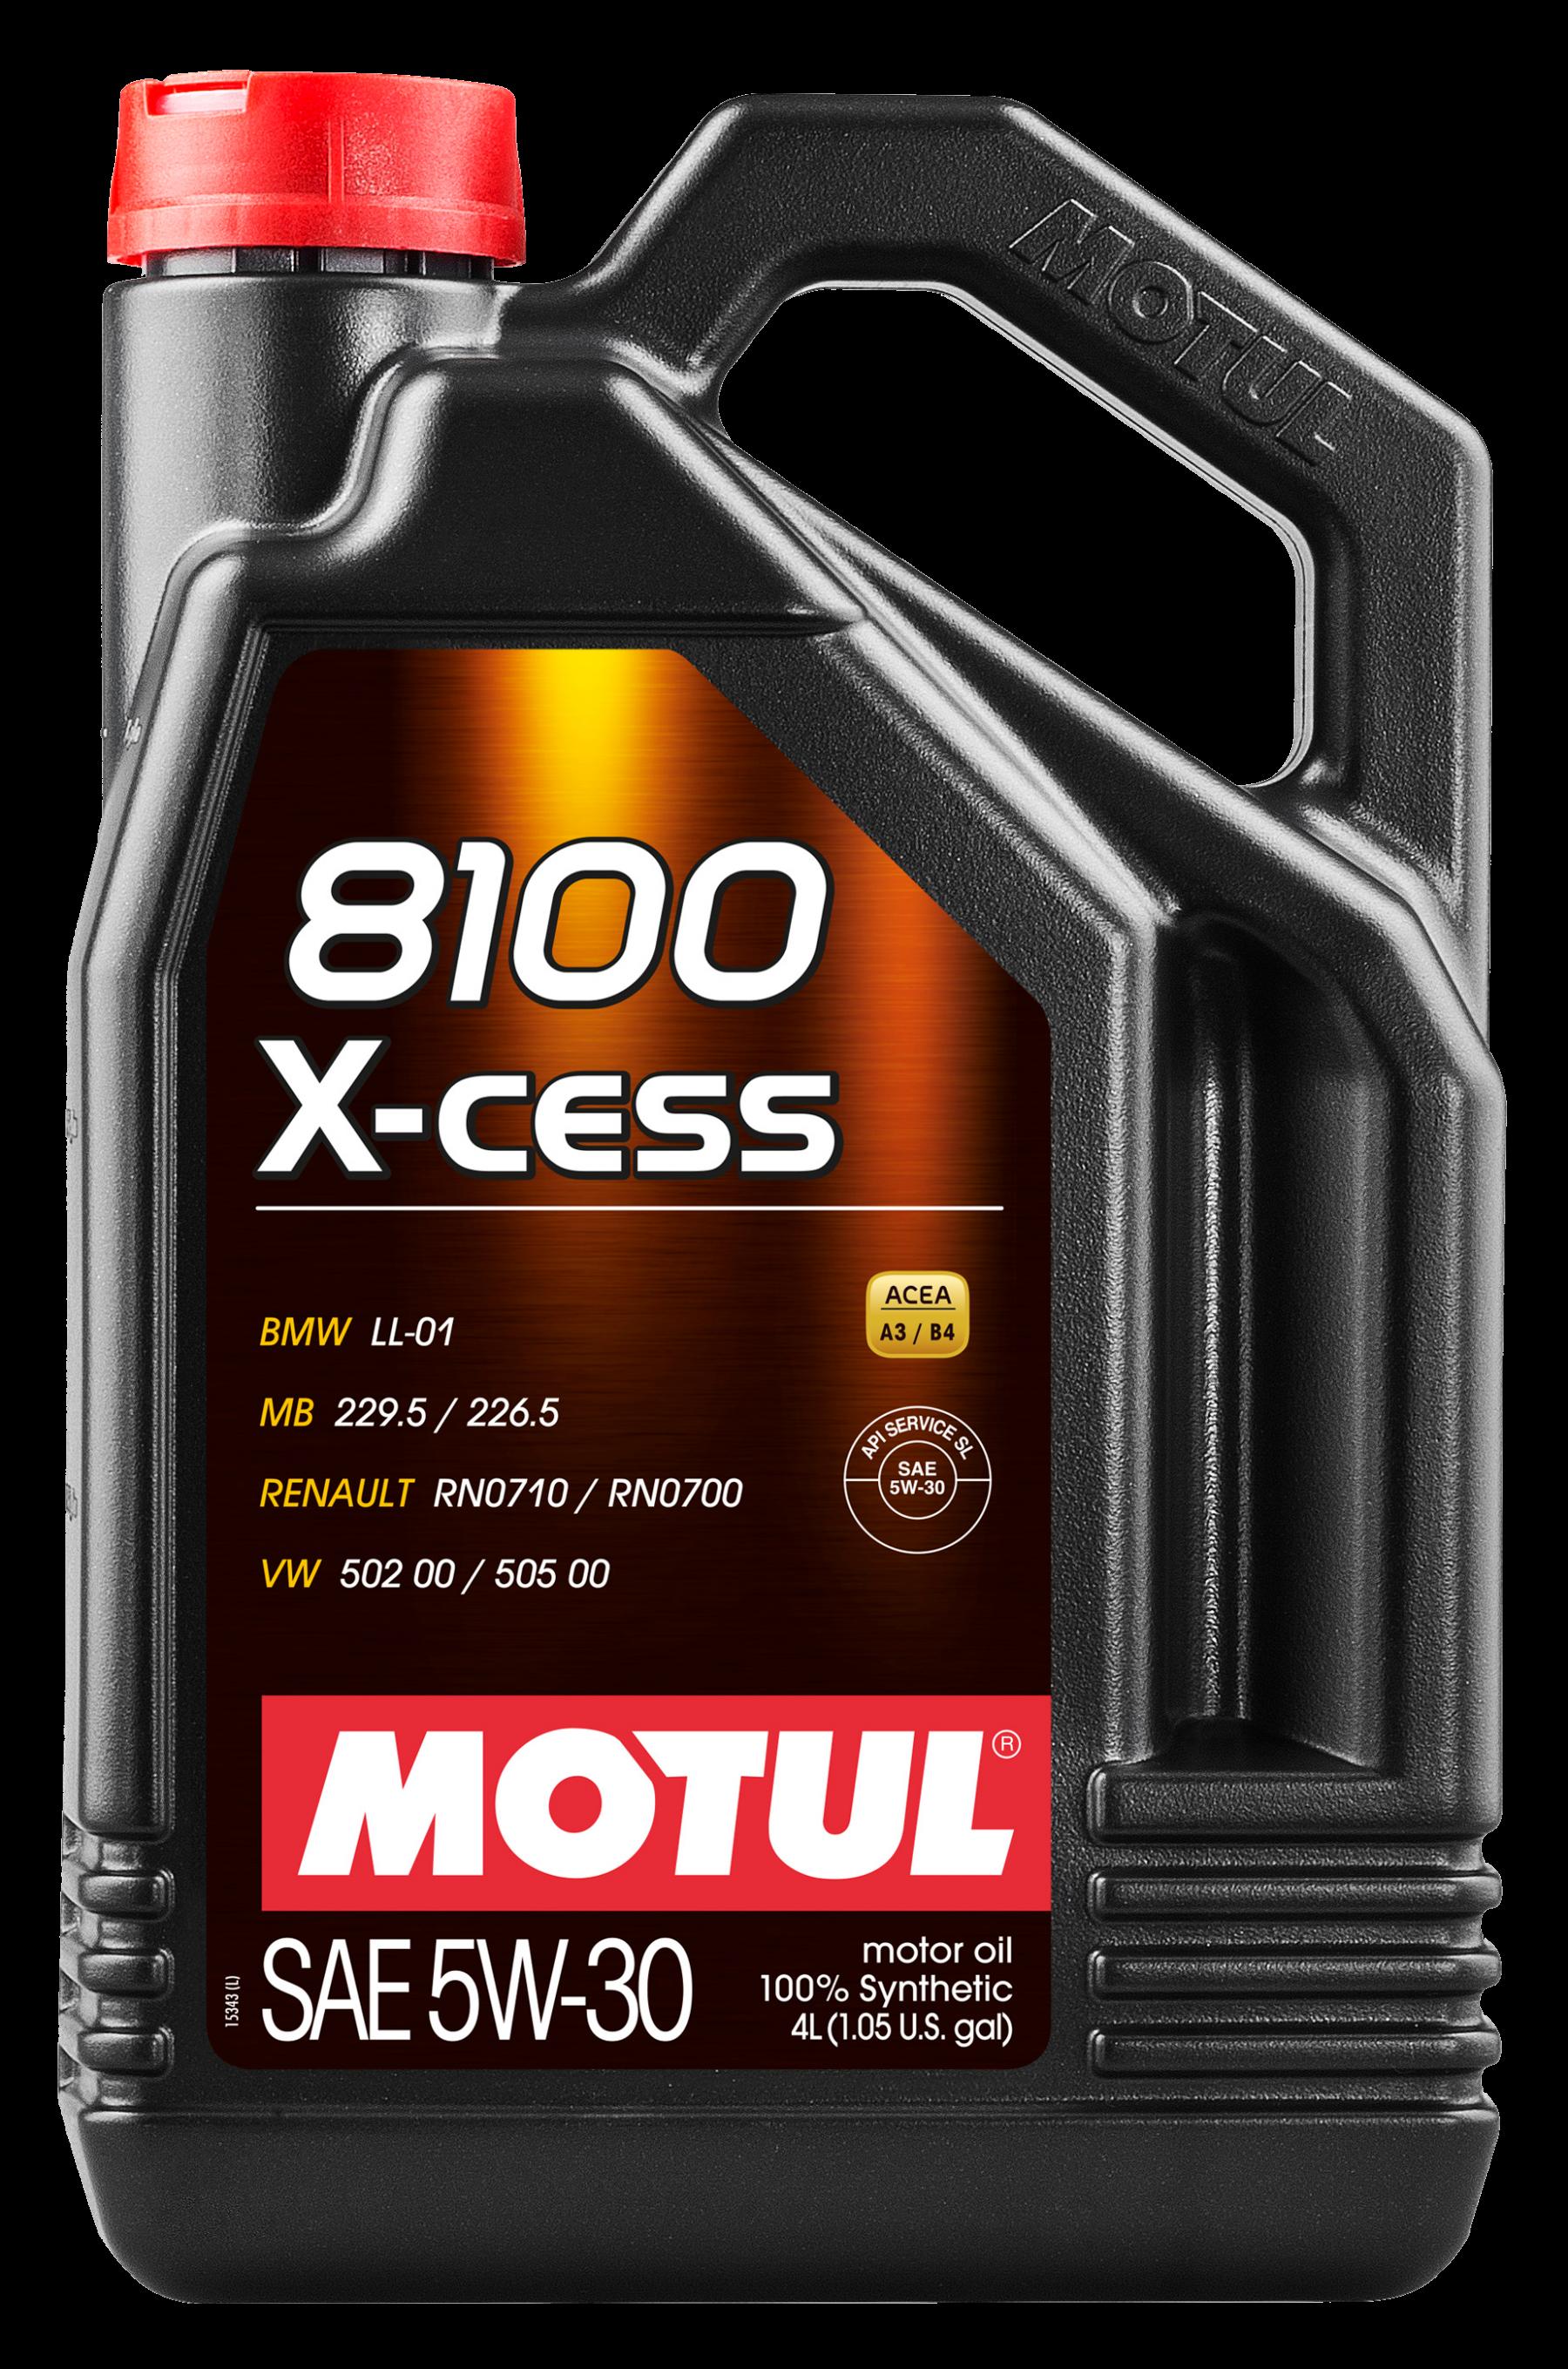 Motul 8100  X-cess 5w-30